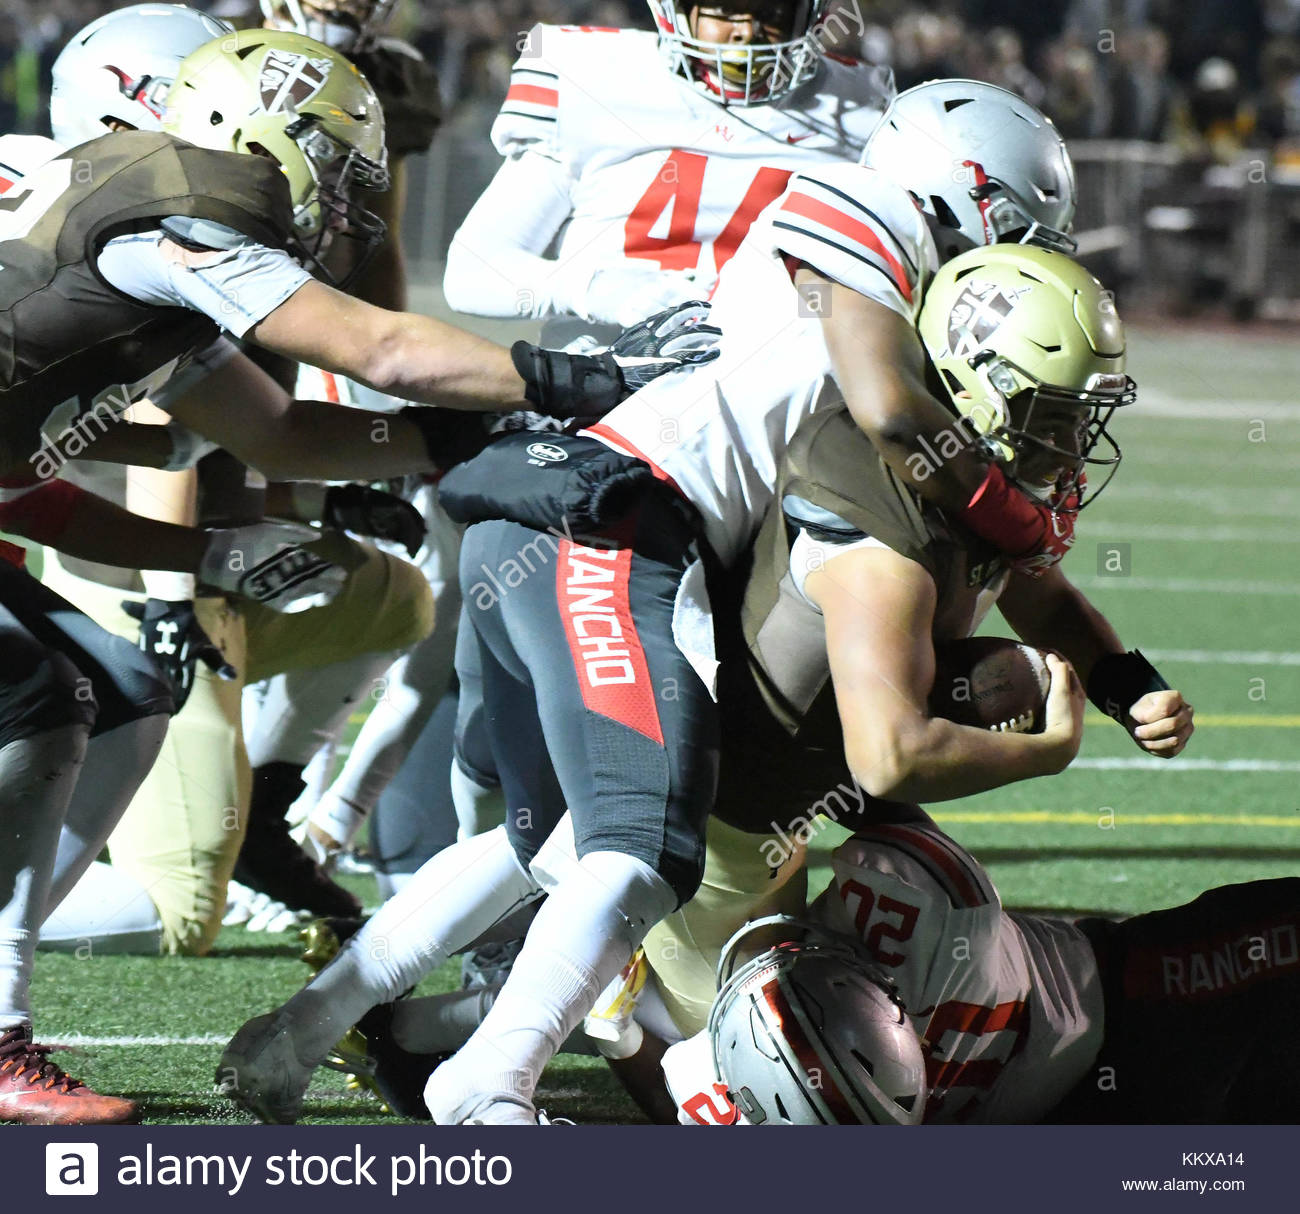 La Canada, California, USA. 1st Dec, 2017. St. Francis quarterback Darius Perrantes (7) runs for a t touchdown against - Stock Image